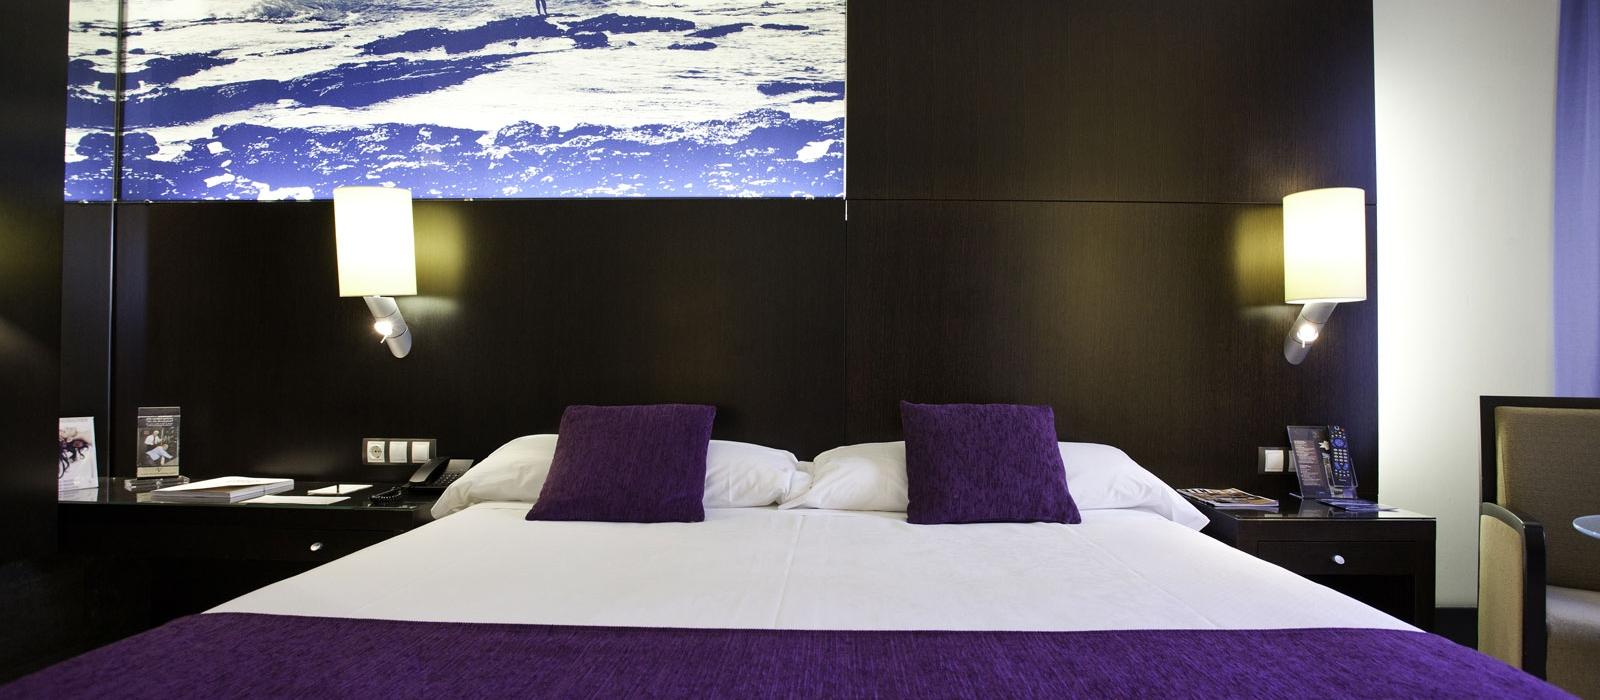 Übernachtung im Hotel Vincci Marítimo in Barcelona - Junior Suiten